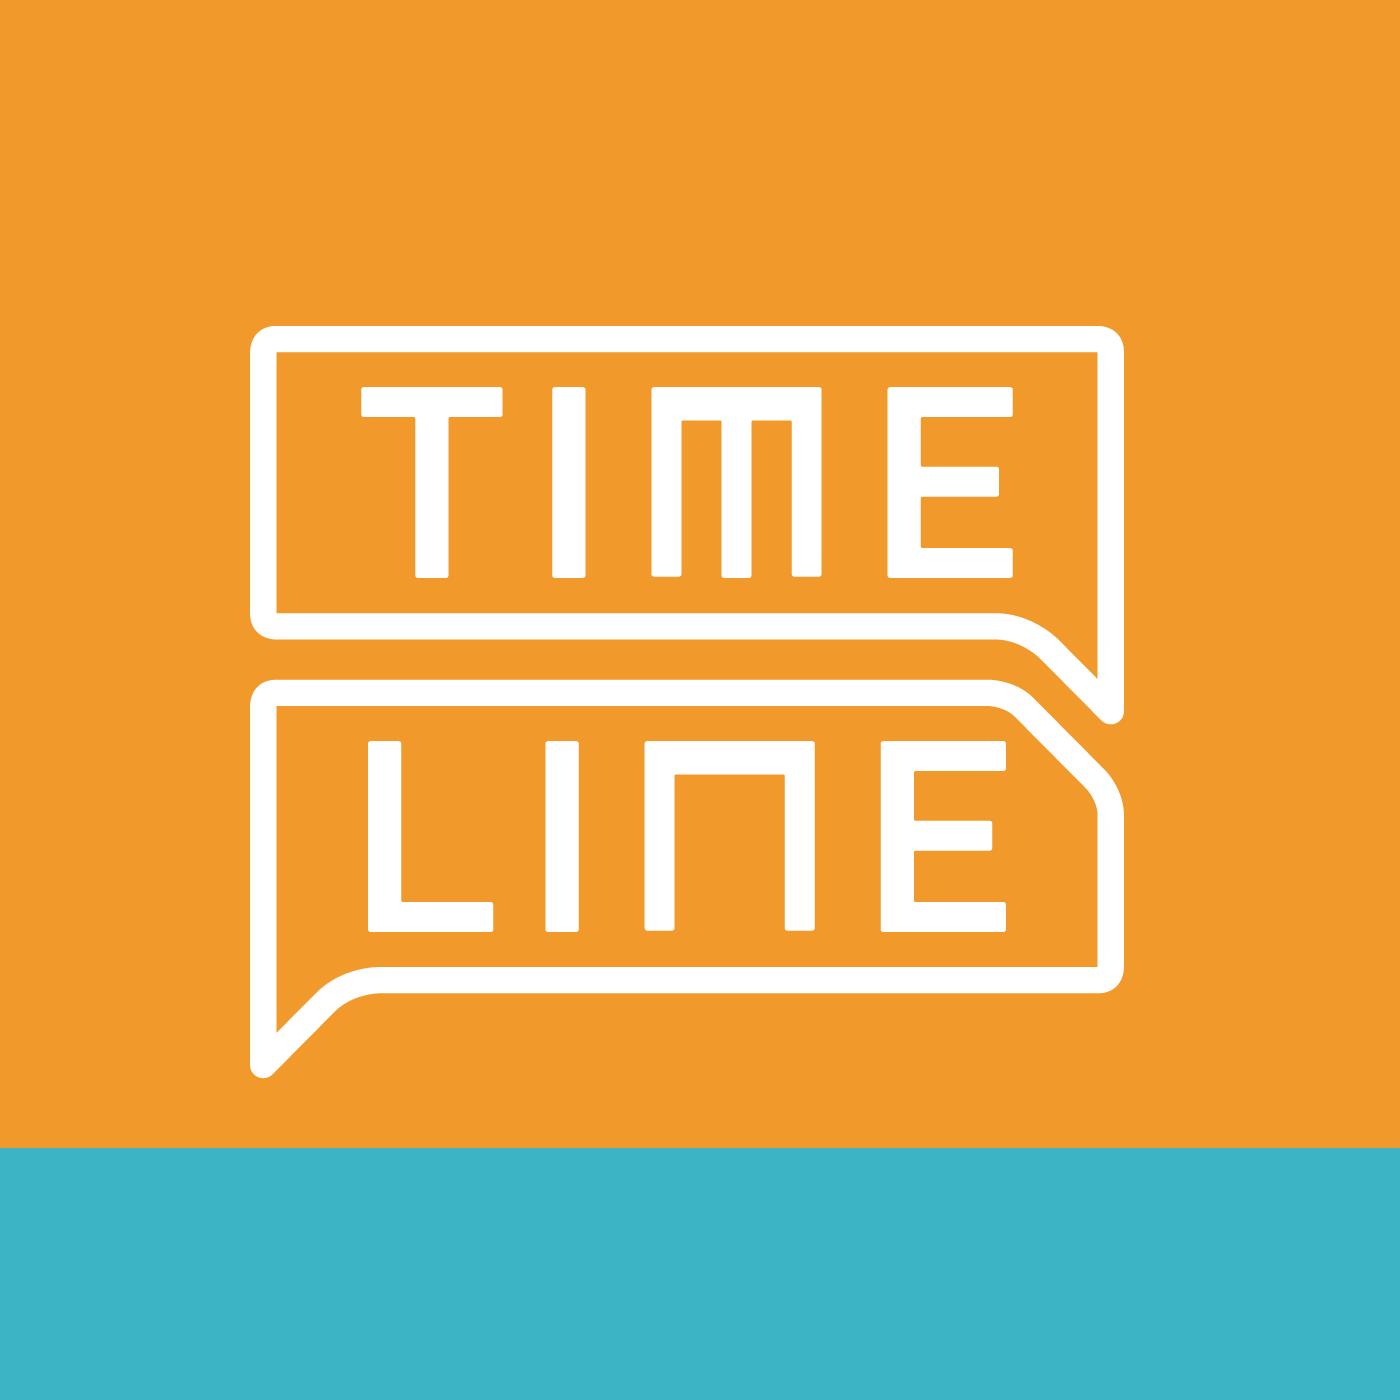 Timeline Gaúcha 29/03/2017